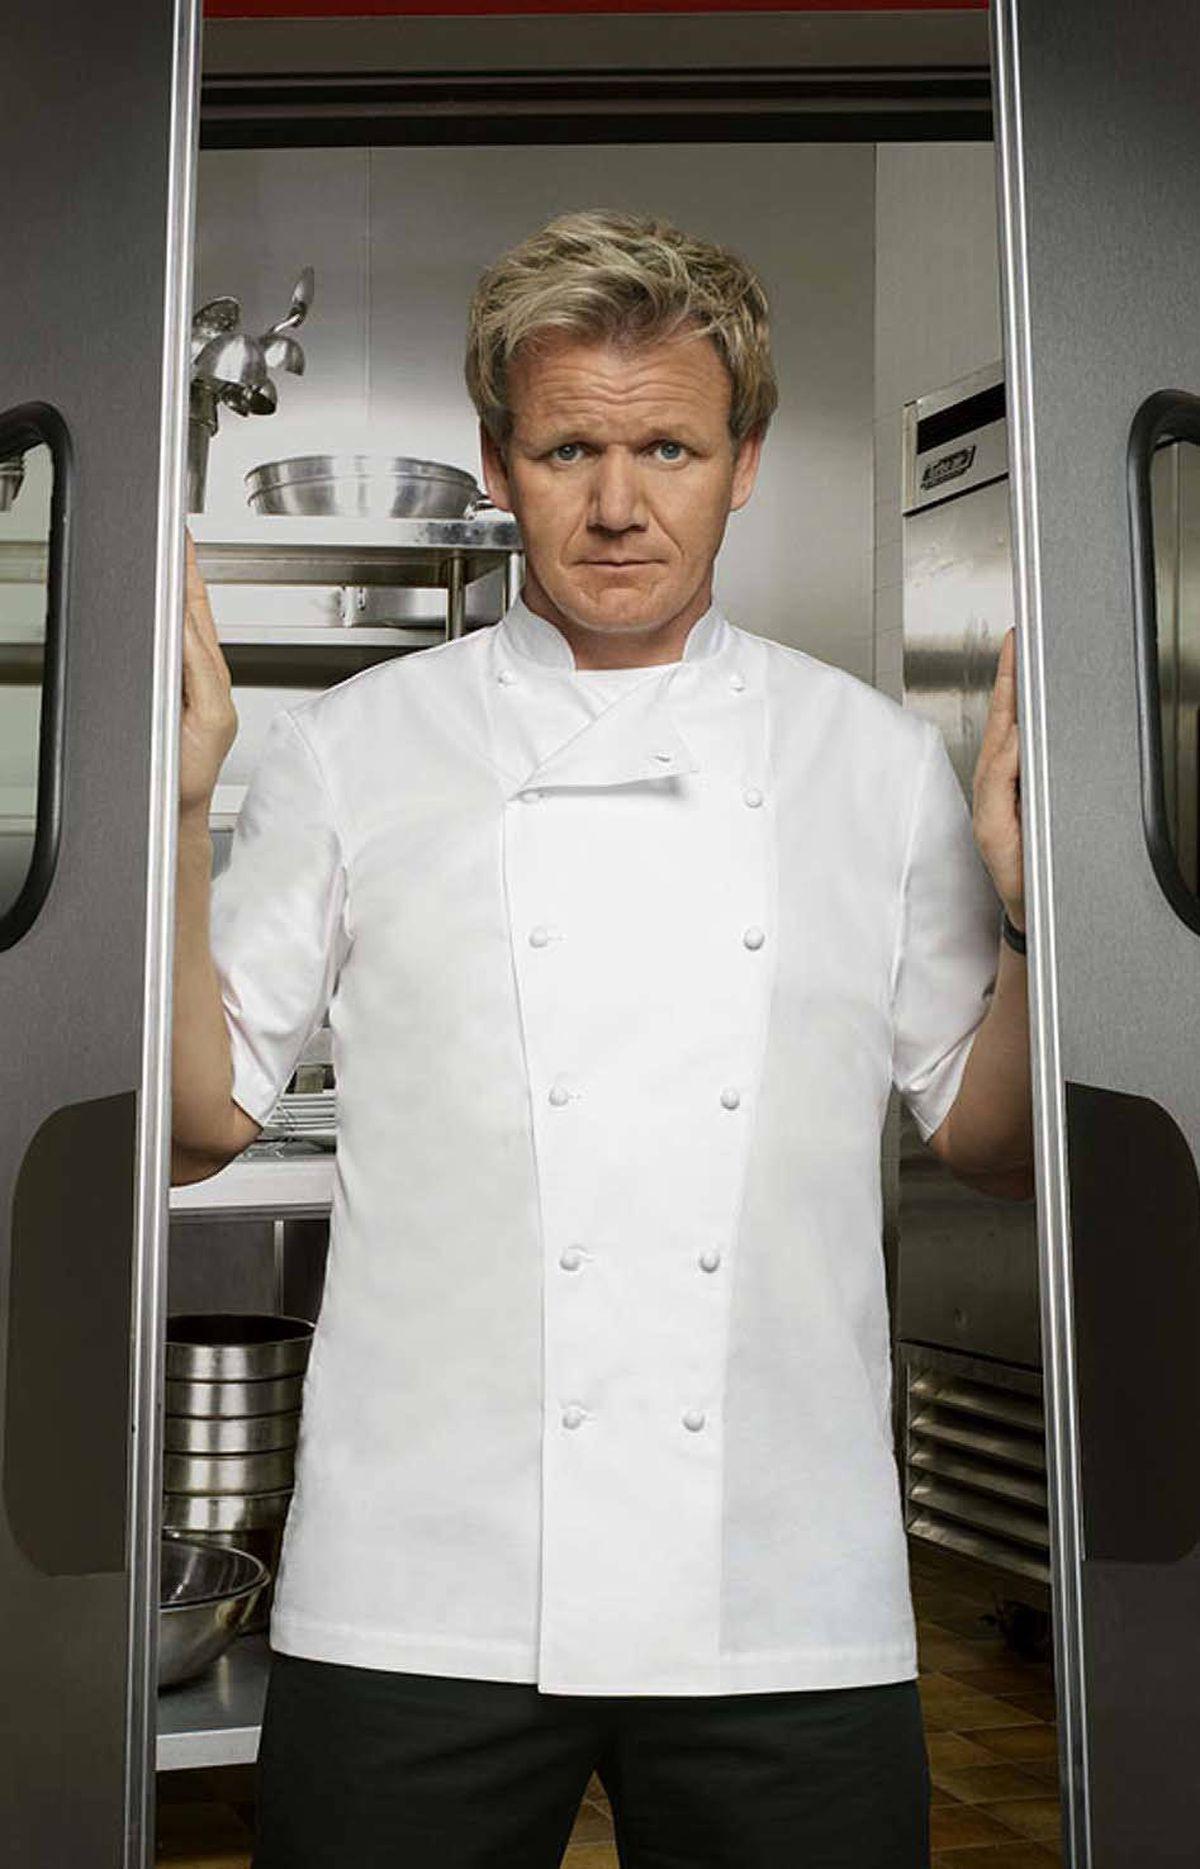 Gordon Ramsay Kitchen Nightmares Fremont